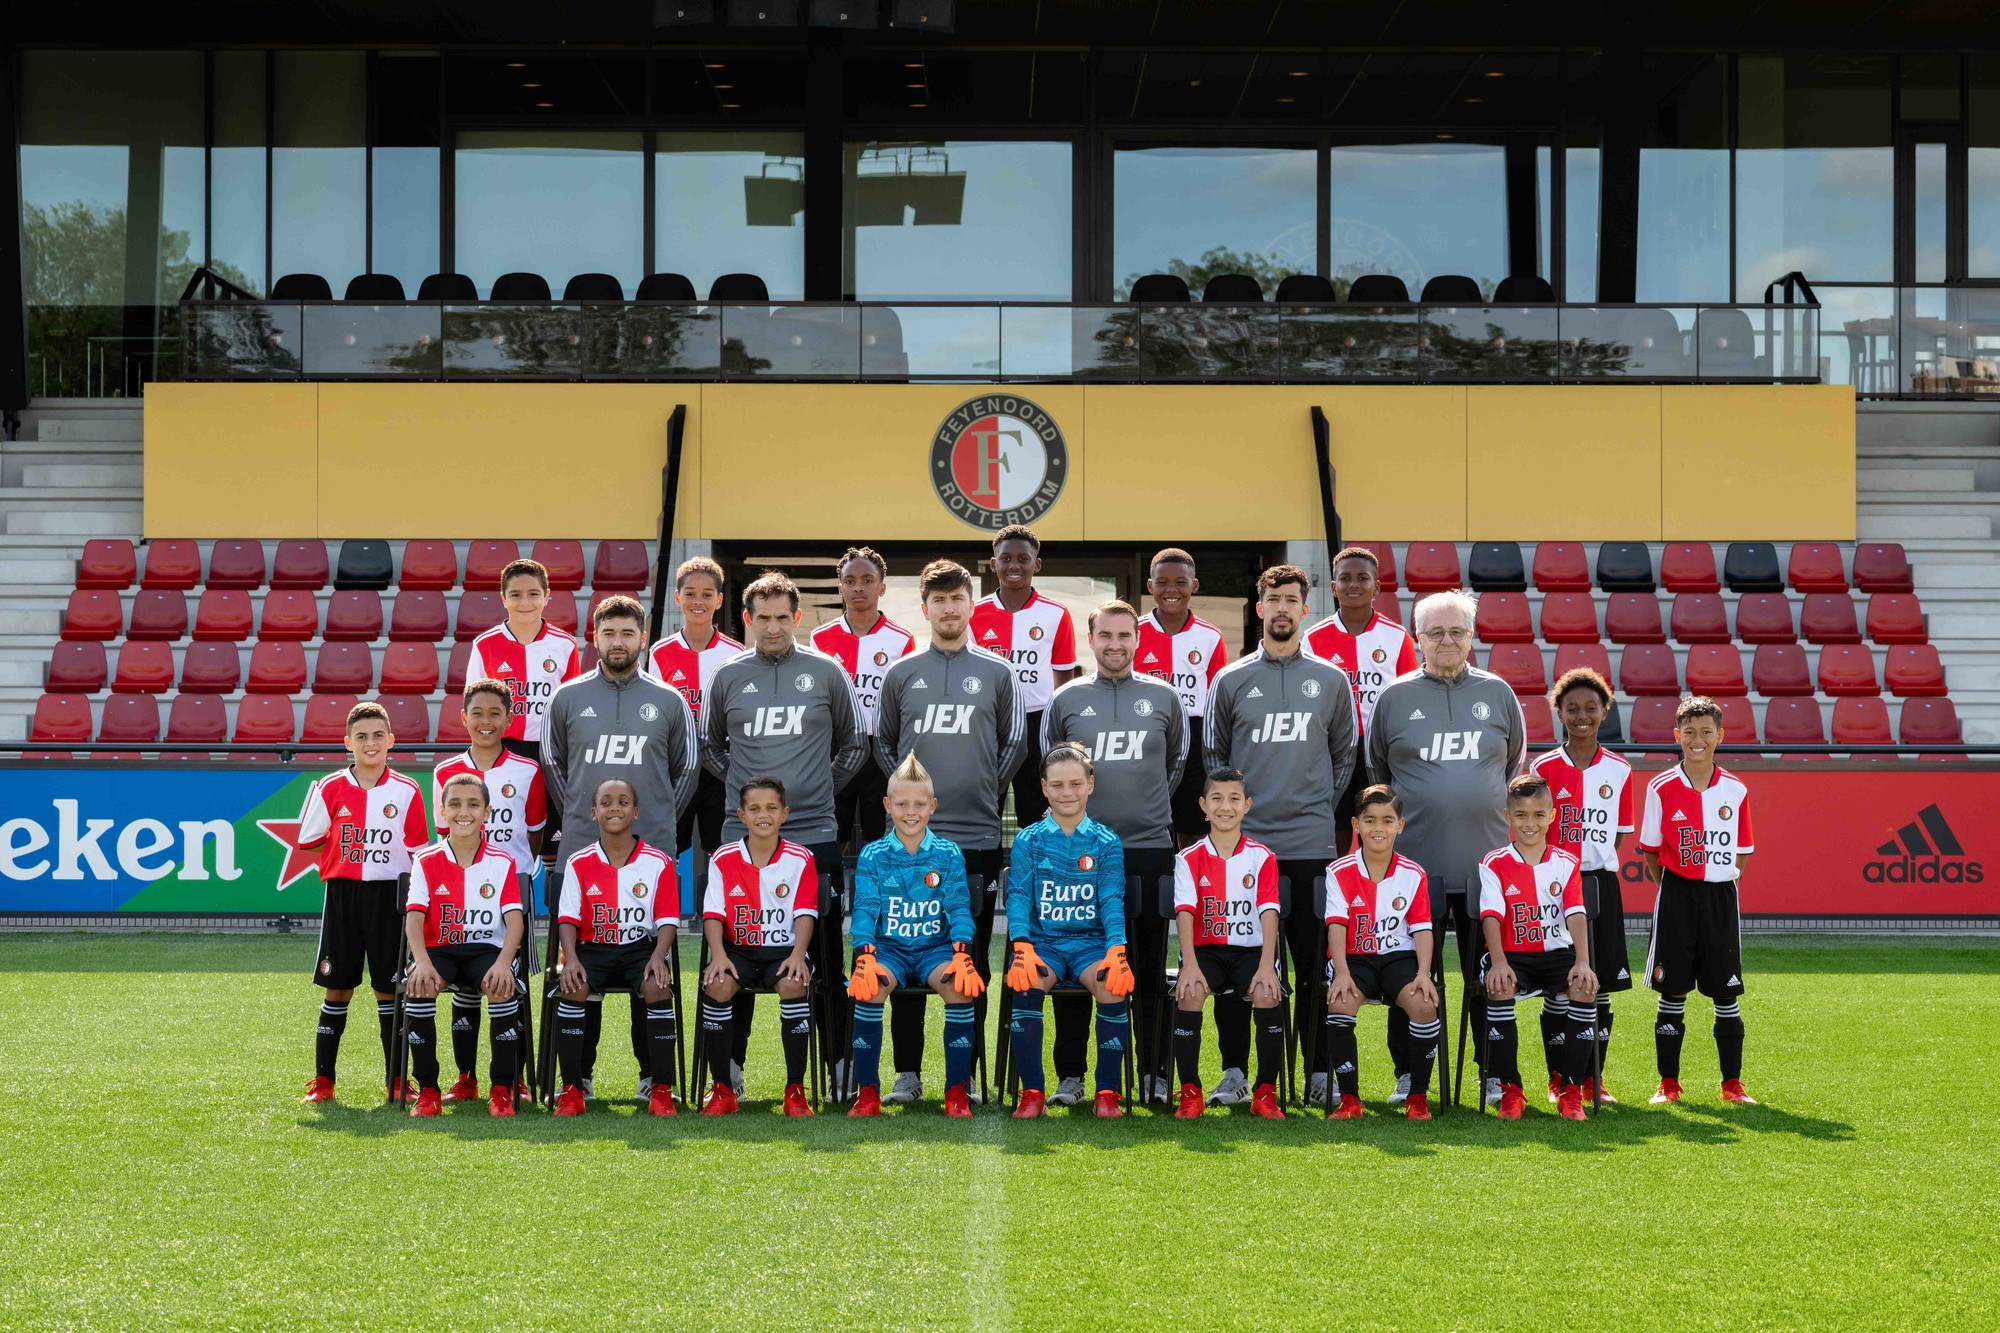 Feyenoord O11 20212022